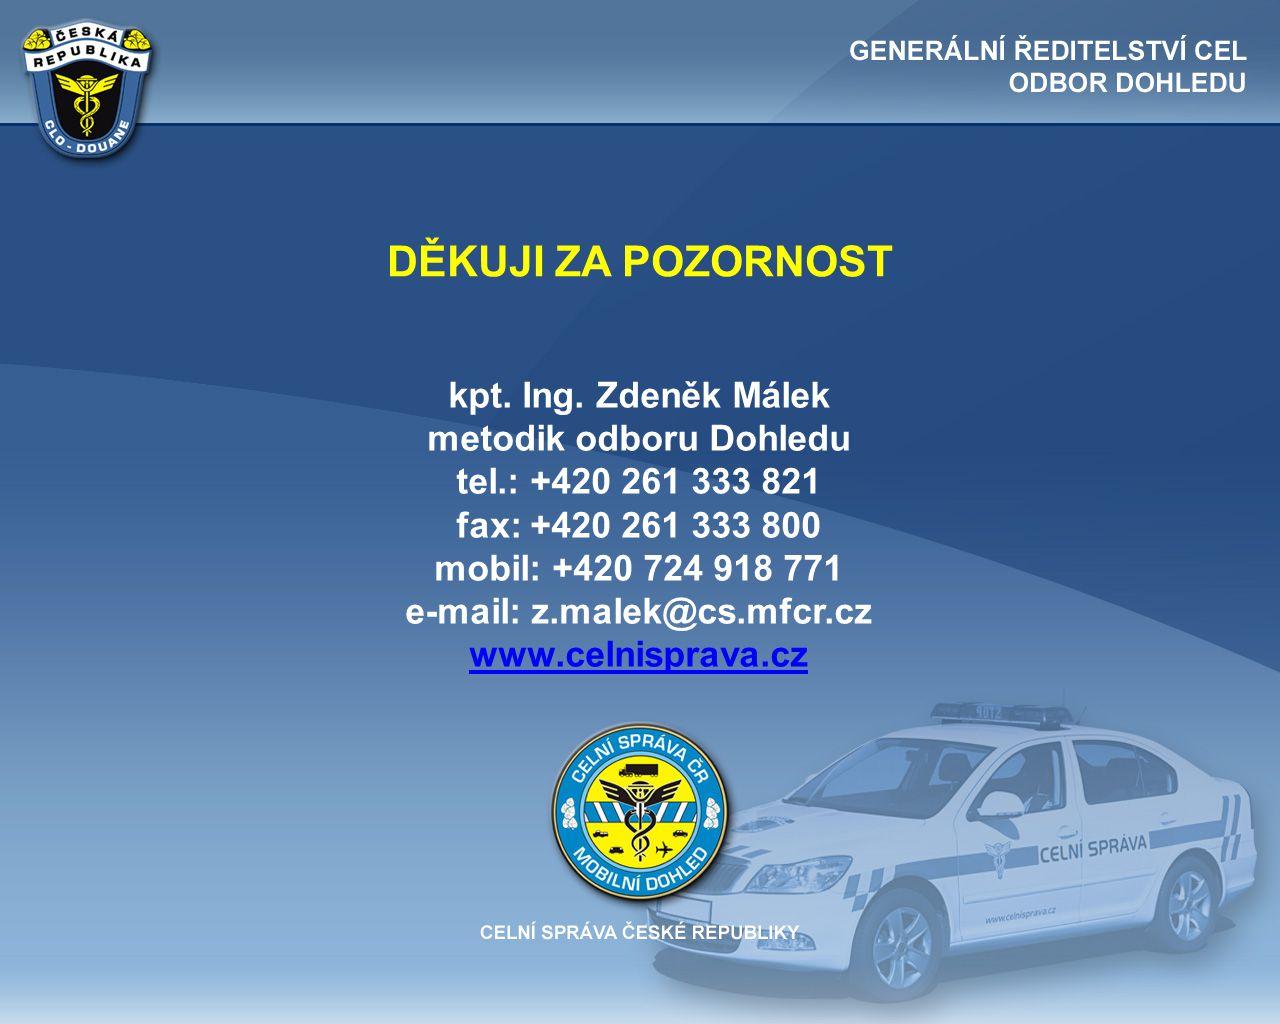 metodik odboru Dohledu e-mail: z.malek@cs.mfcr.cz